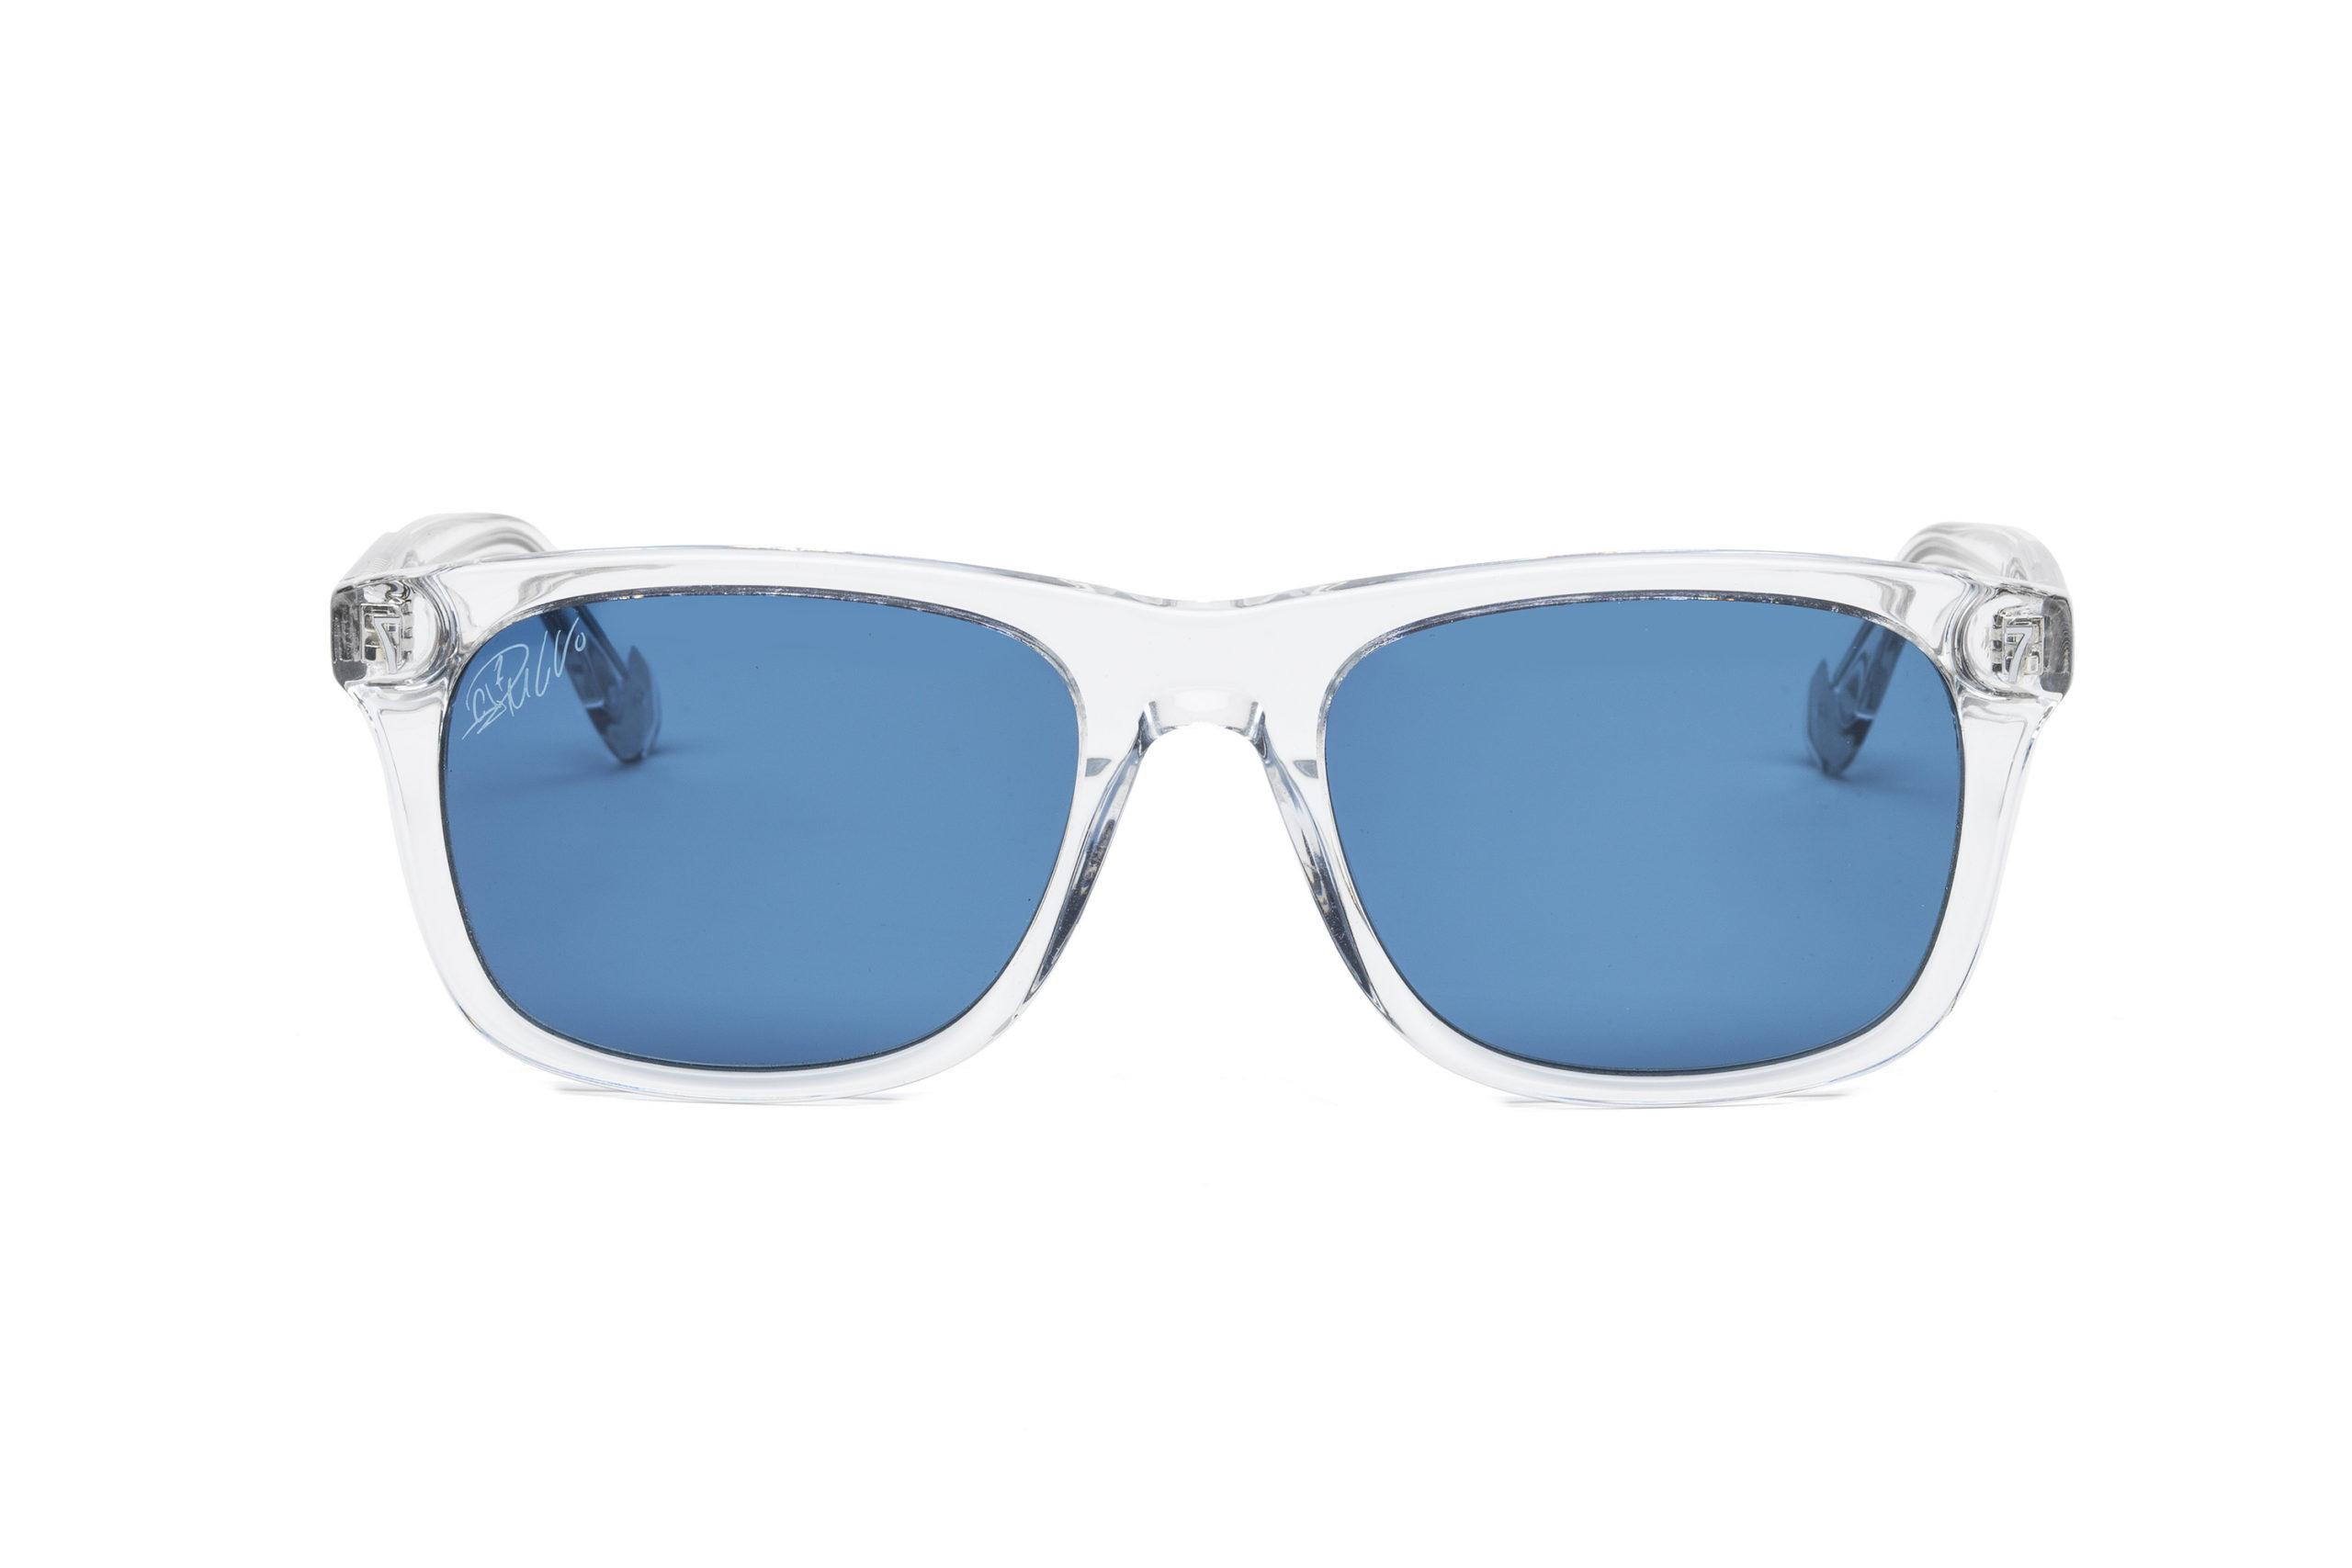 CR7 eyewear by Italia Independent